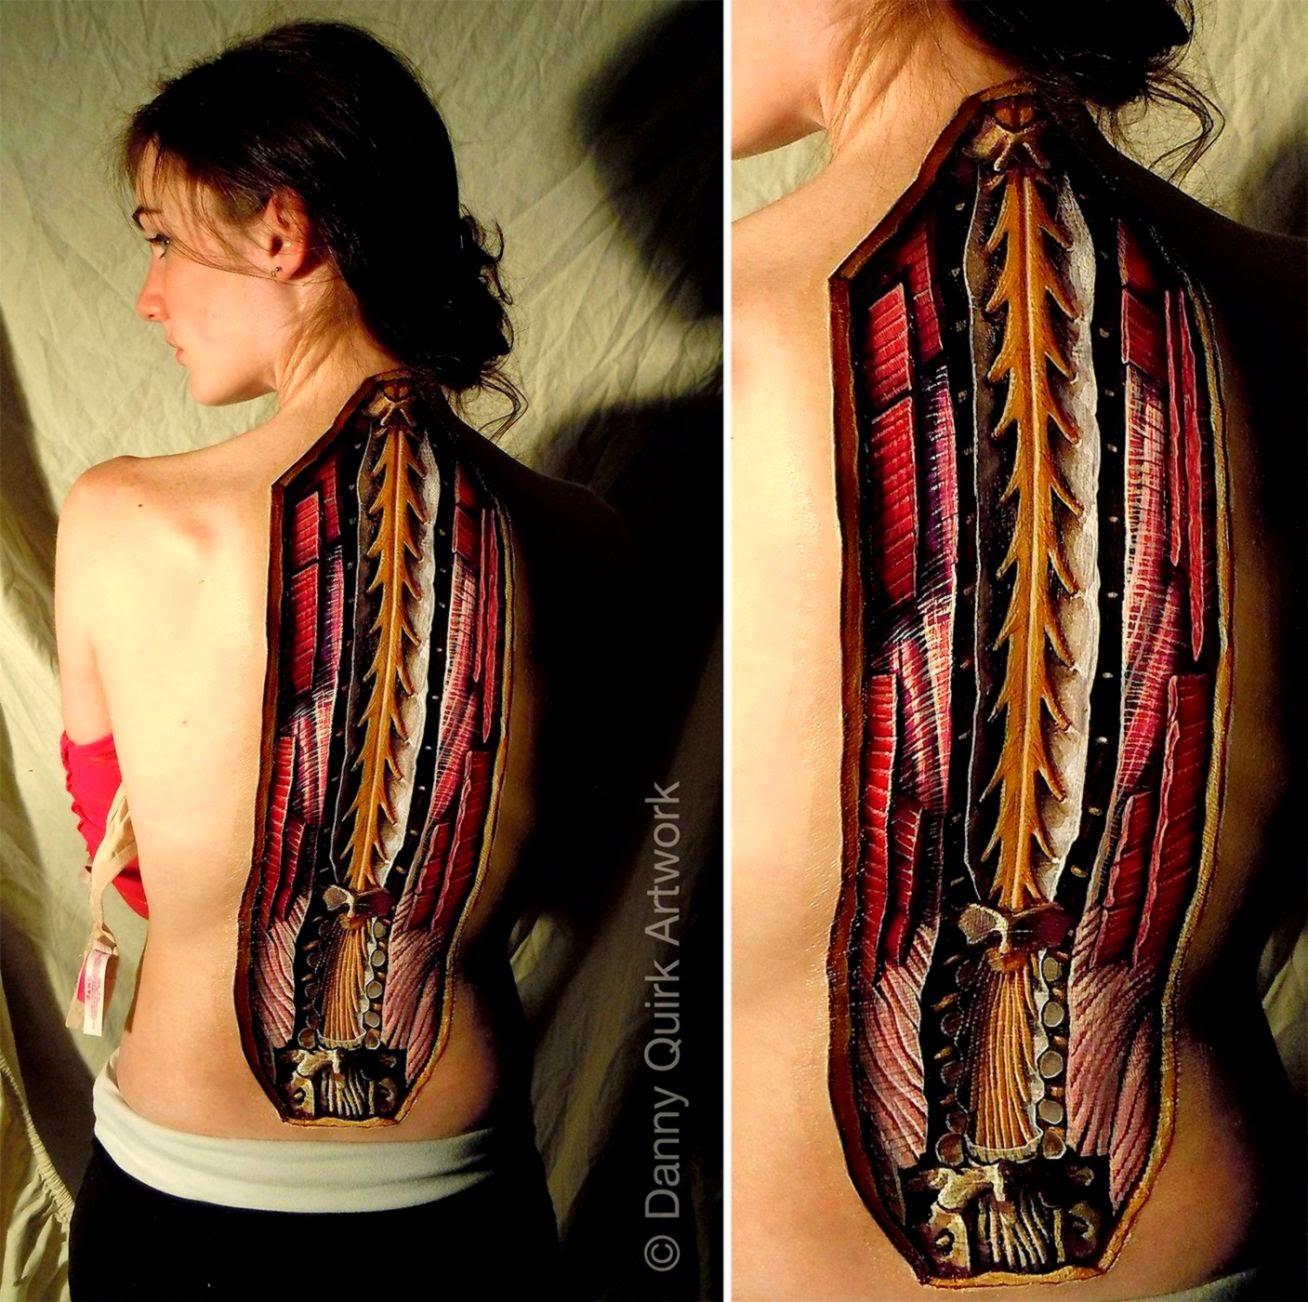 Amazing Anatomical Body Art  IFLScience